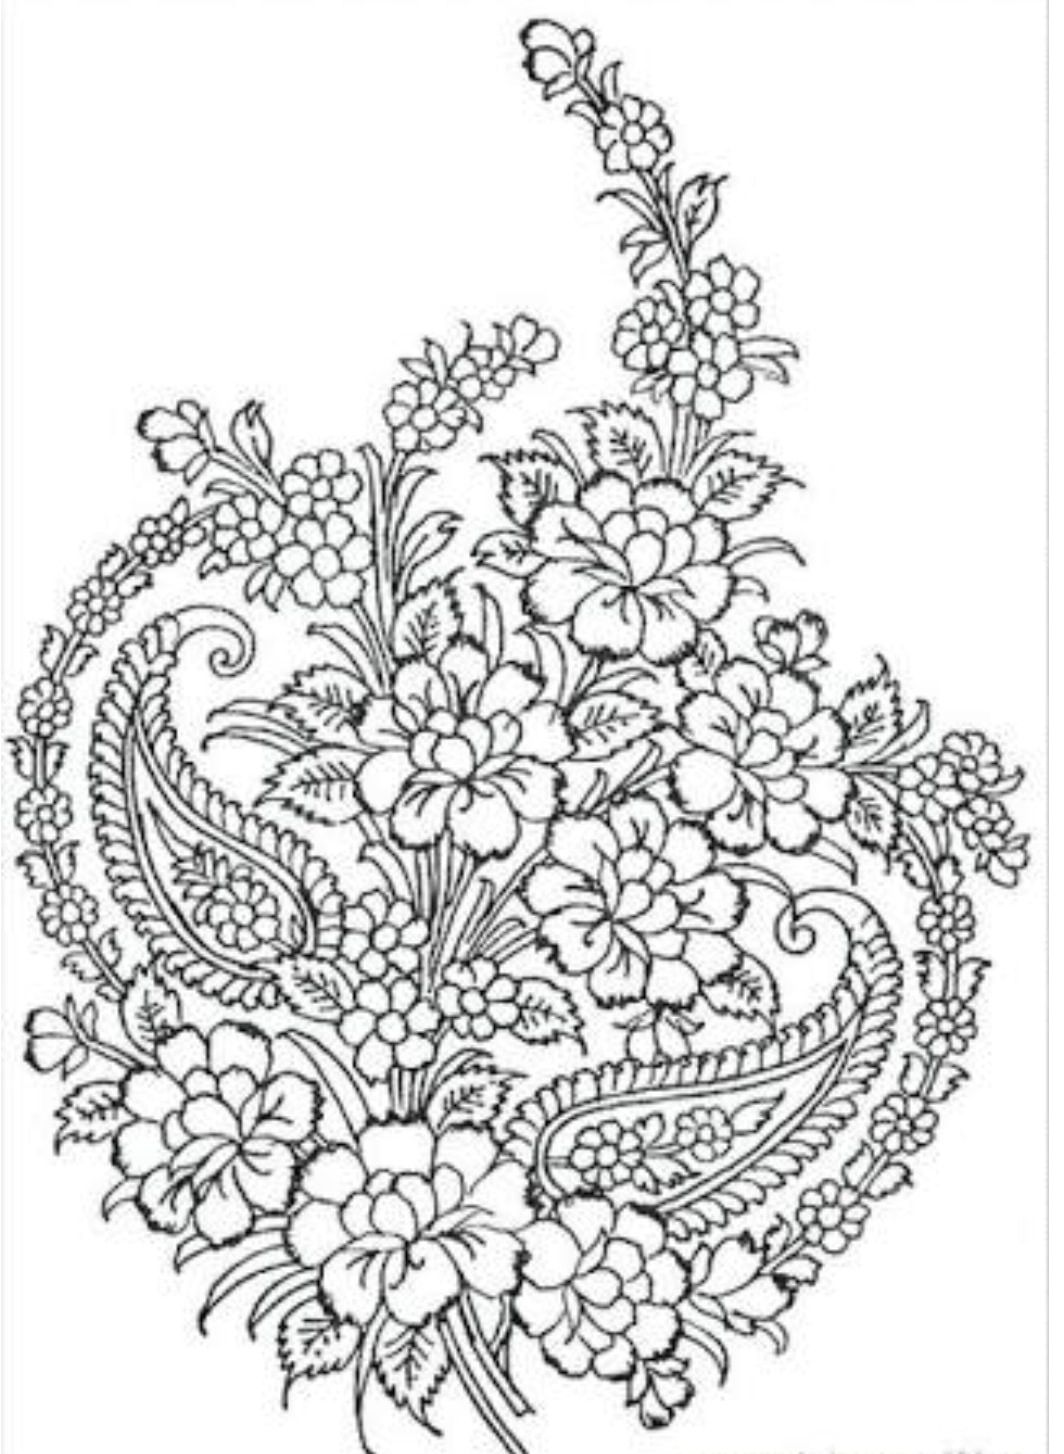 Pin by padmini duggirala on drawings and paintings pinterest